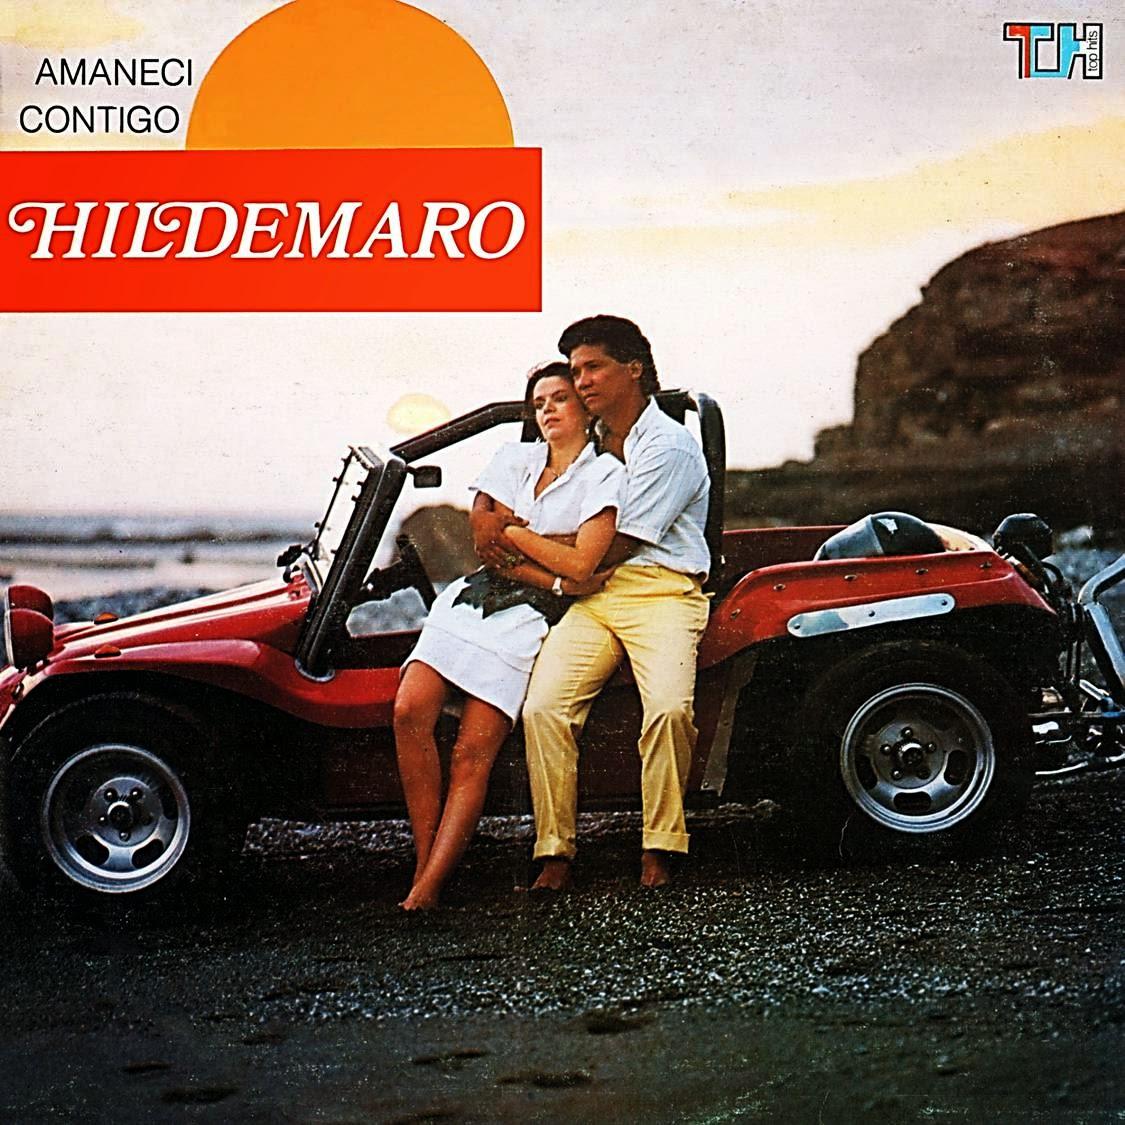 AMANECI CONTIGO - HILDEMARO (1988)